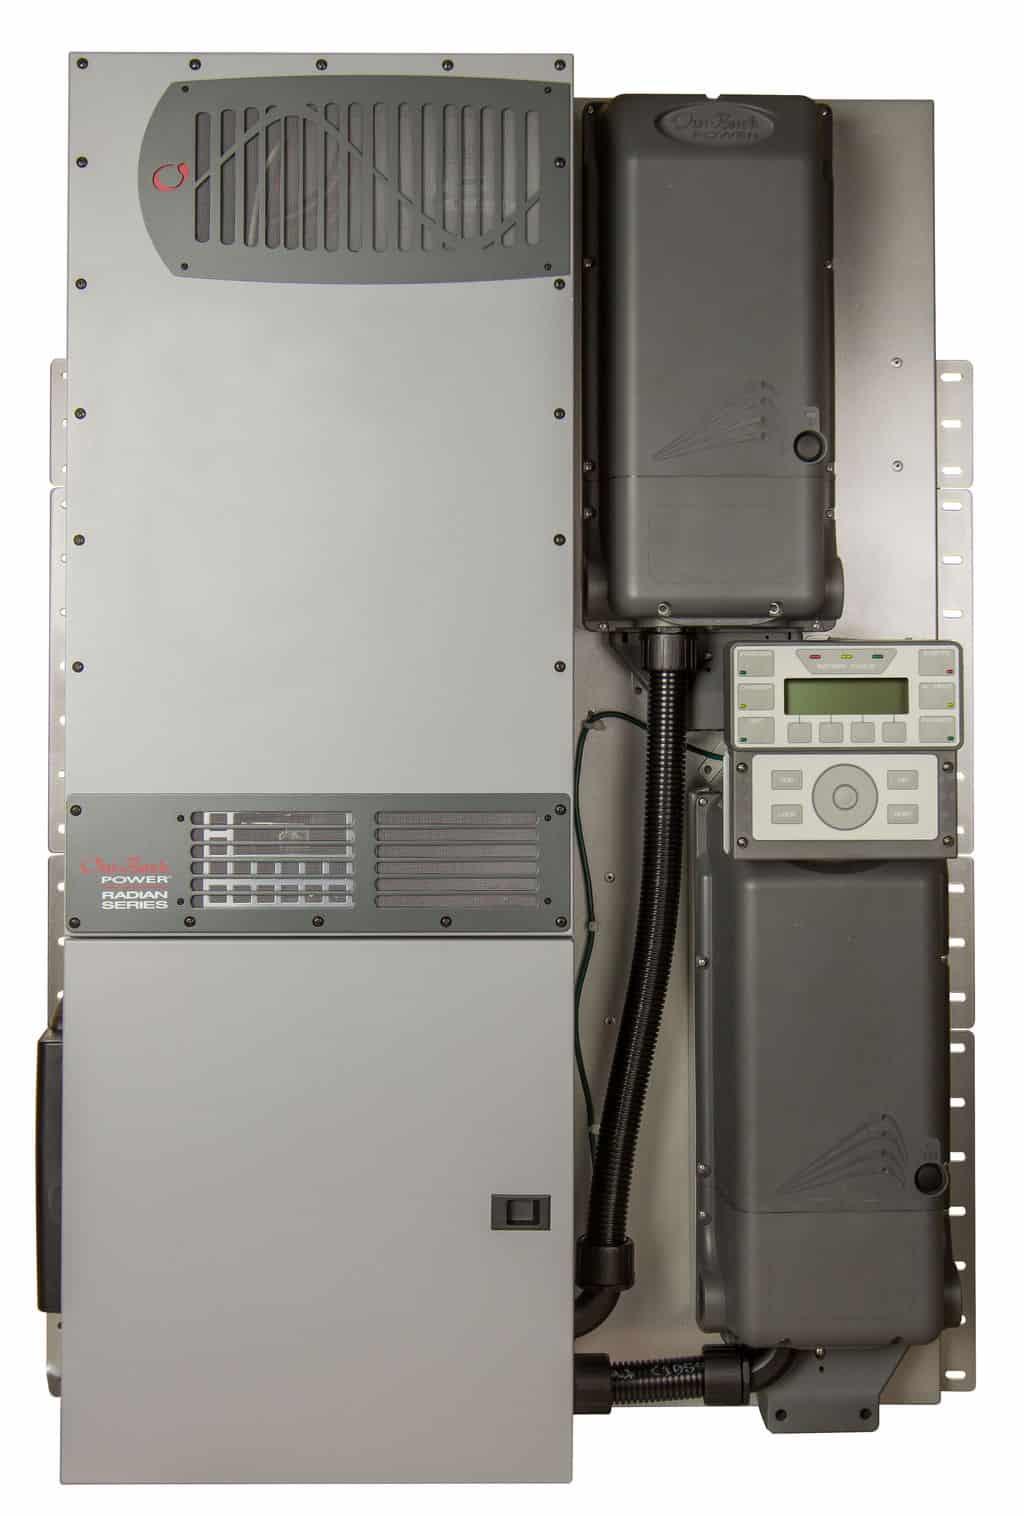 FPR-4048A-300VDC FLEXpower Radian Power Center